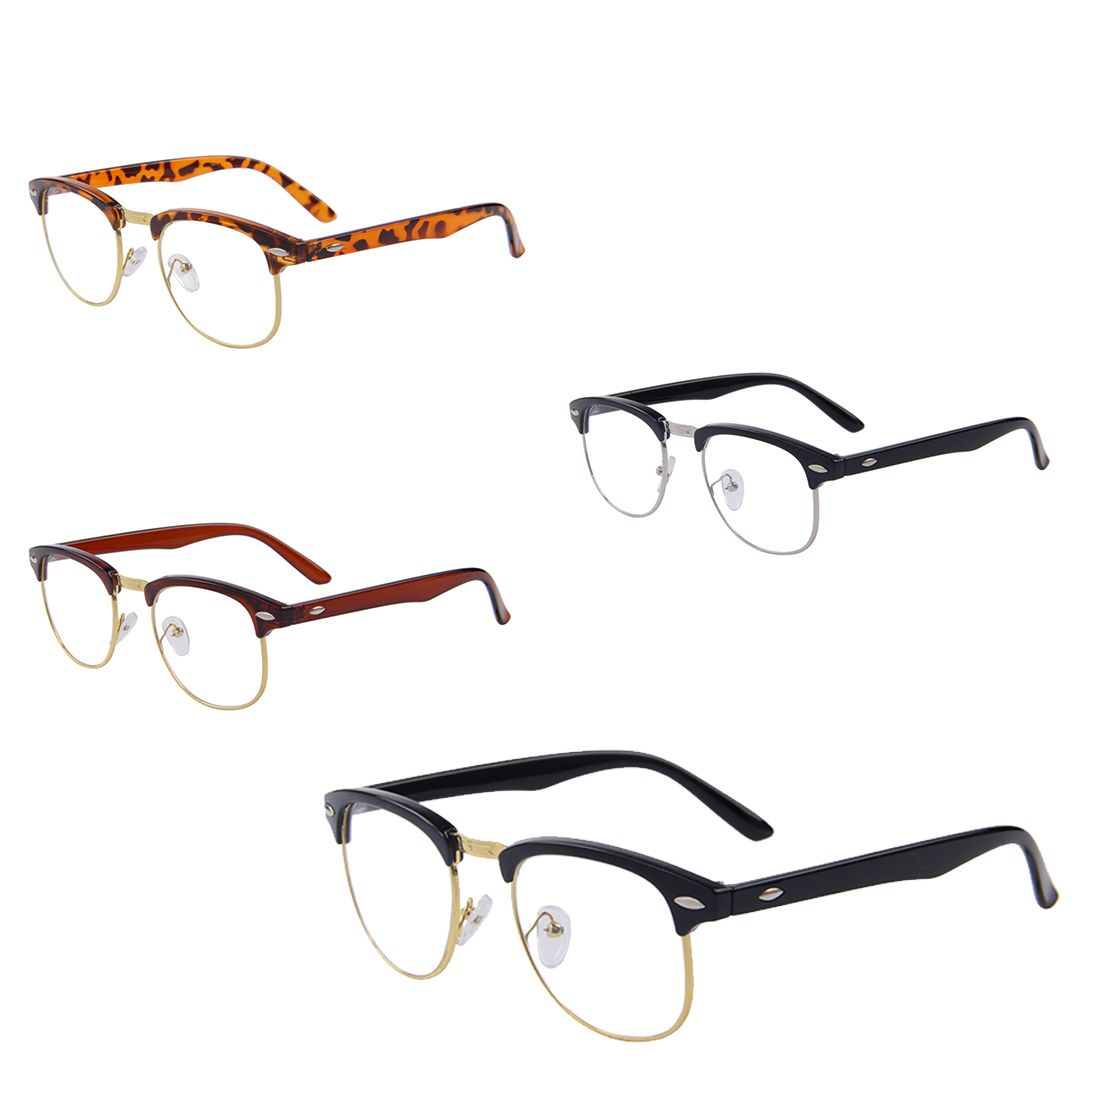 16ac6343eb 1Pc Classic Retro Clear Lens Nerd Frames Glasses Fashion Designed ...